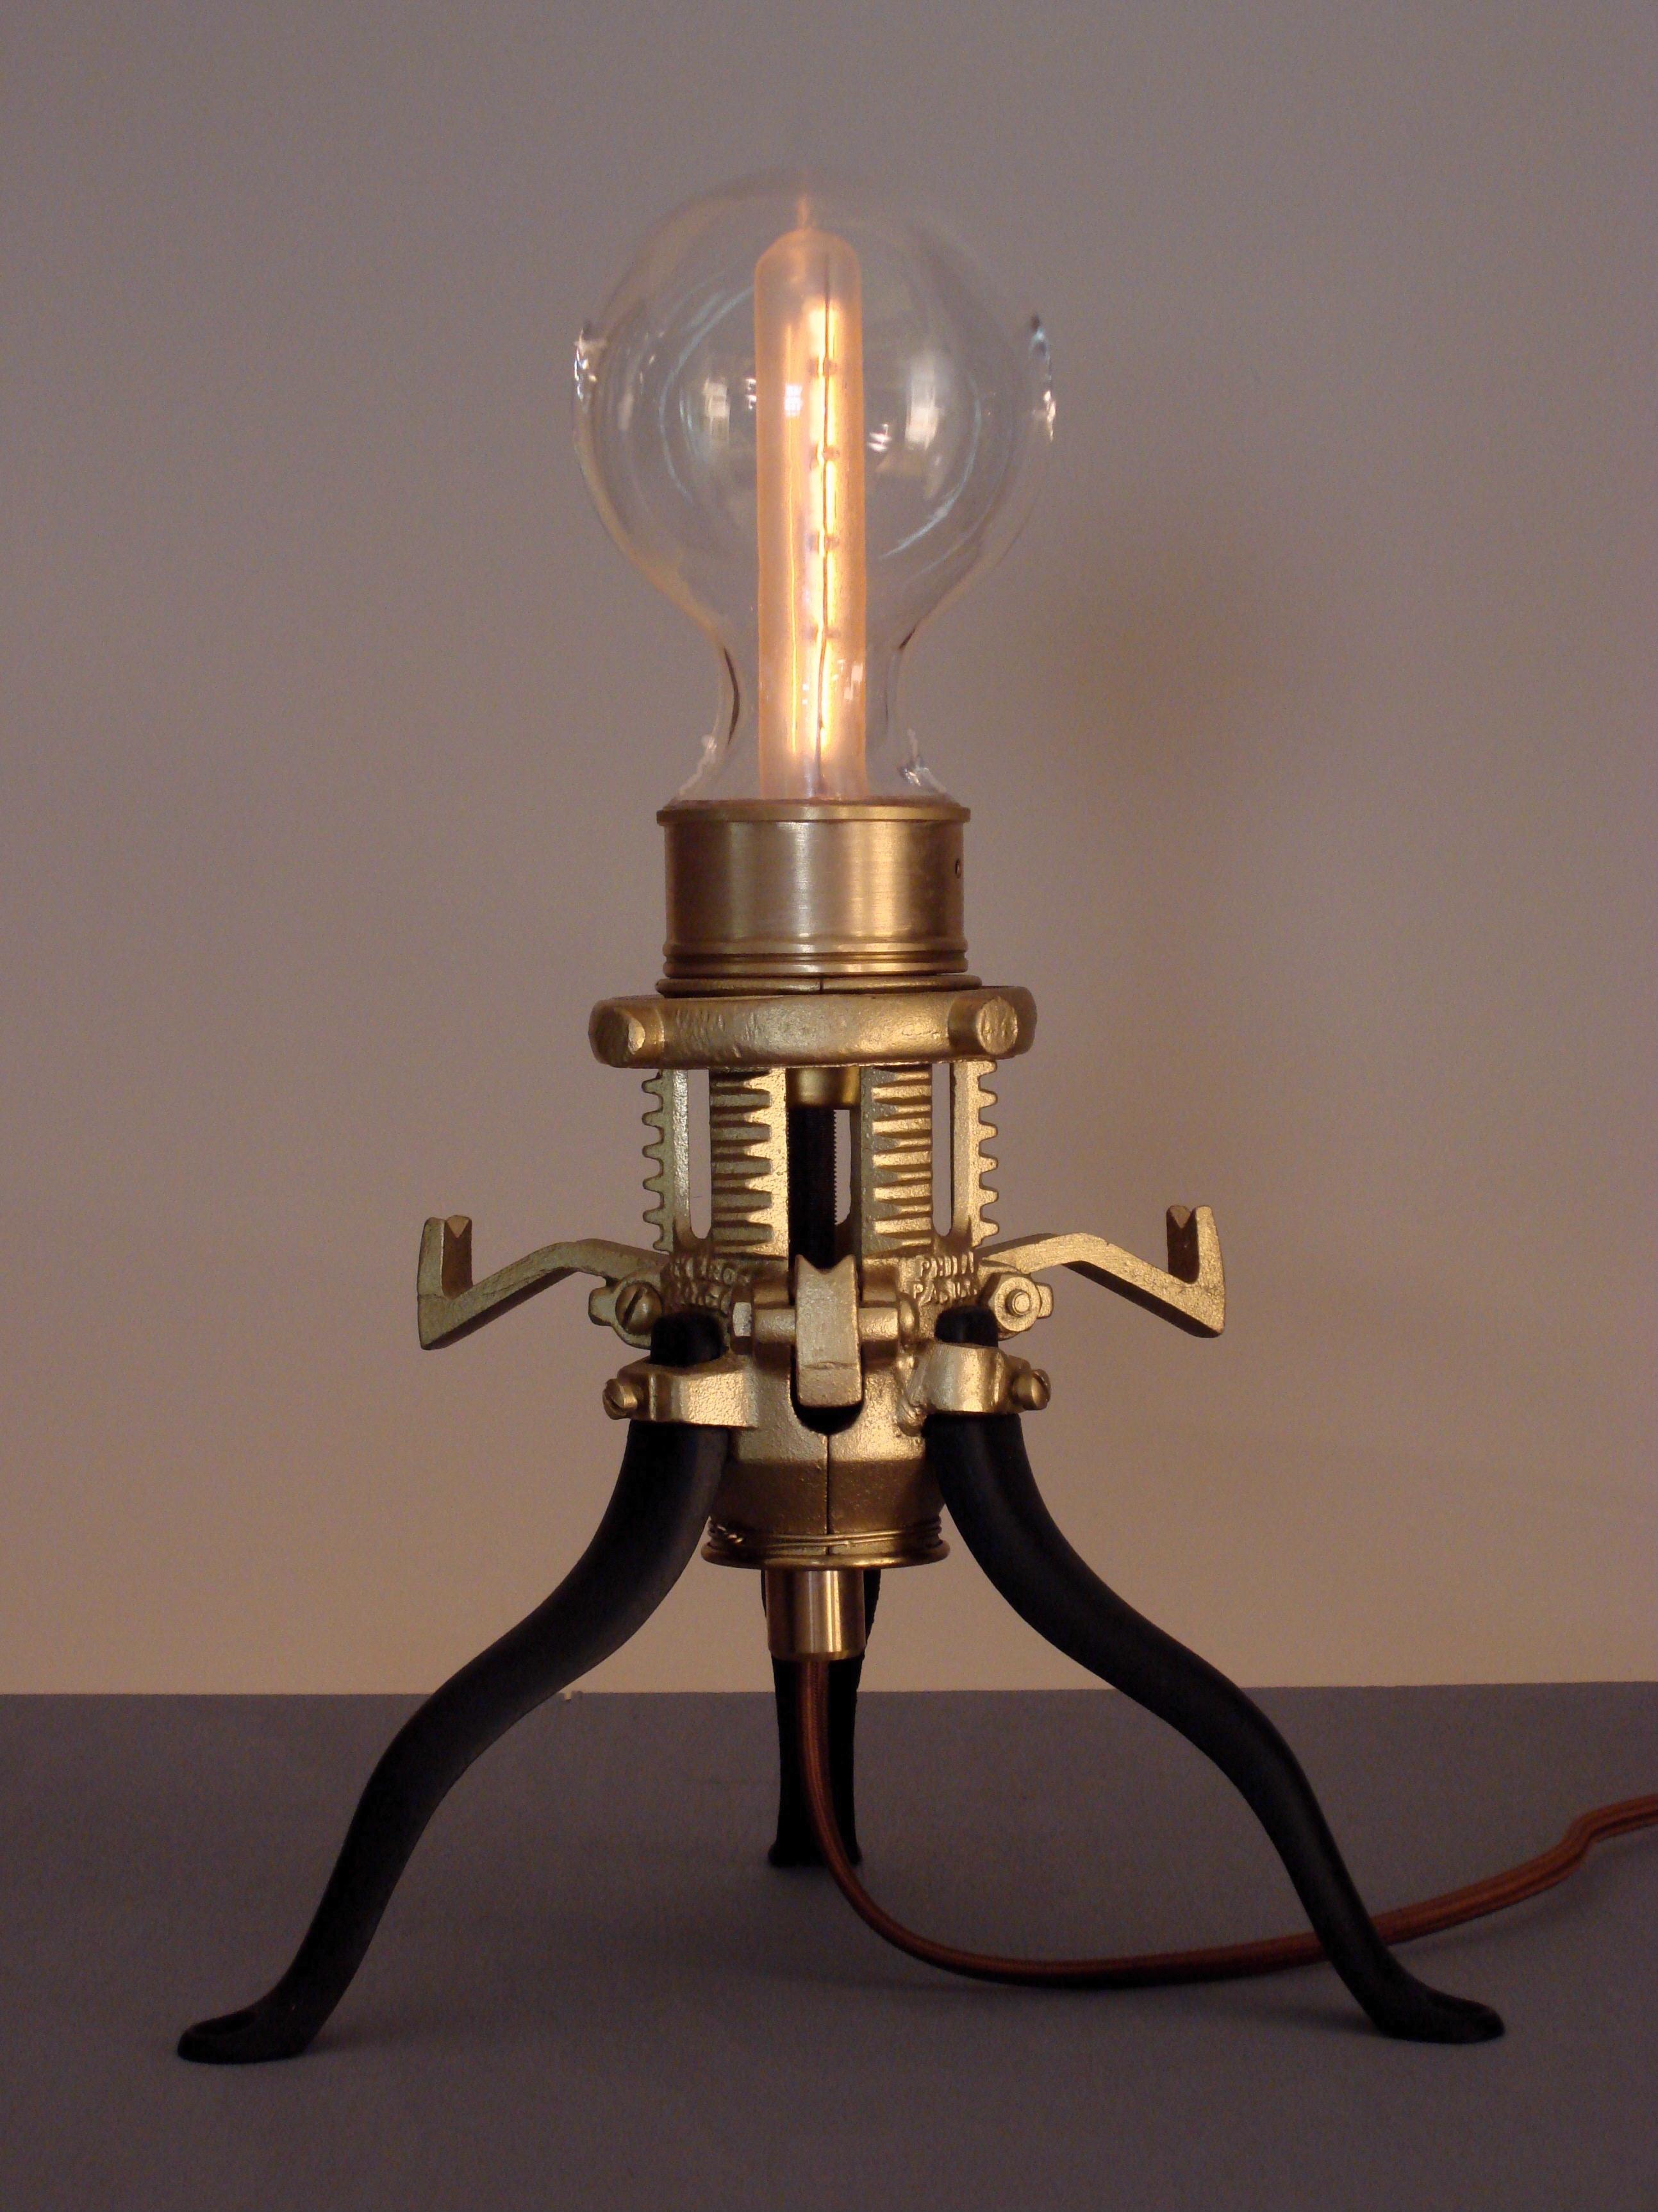 steampunk lighting. Art Donovan- Mr. Peanutski Steampunk Lighting